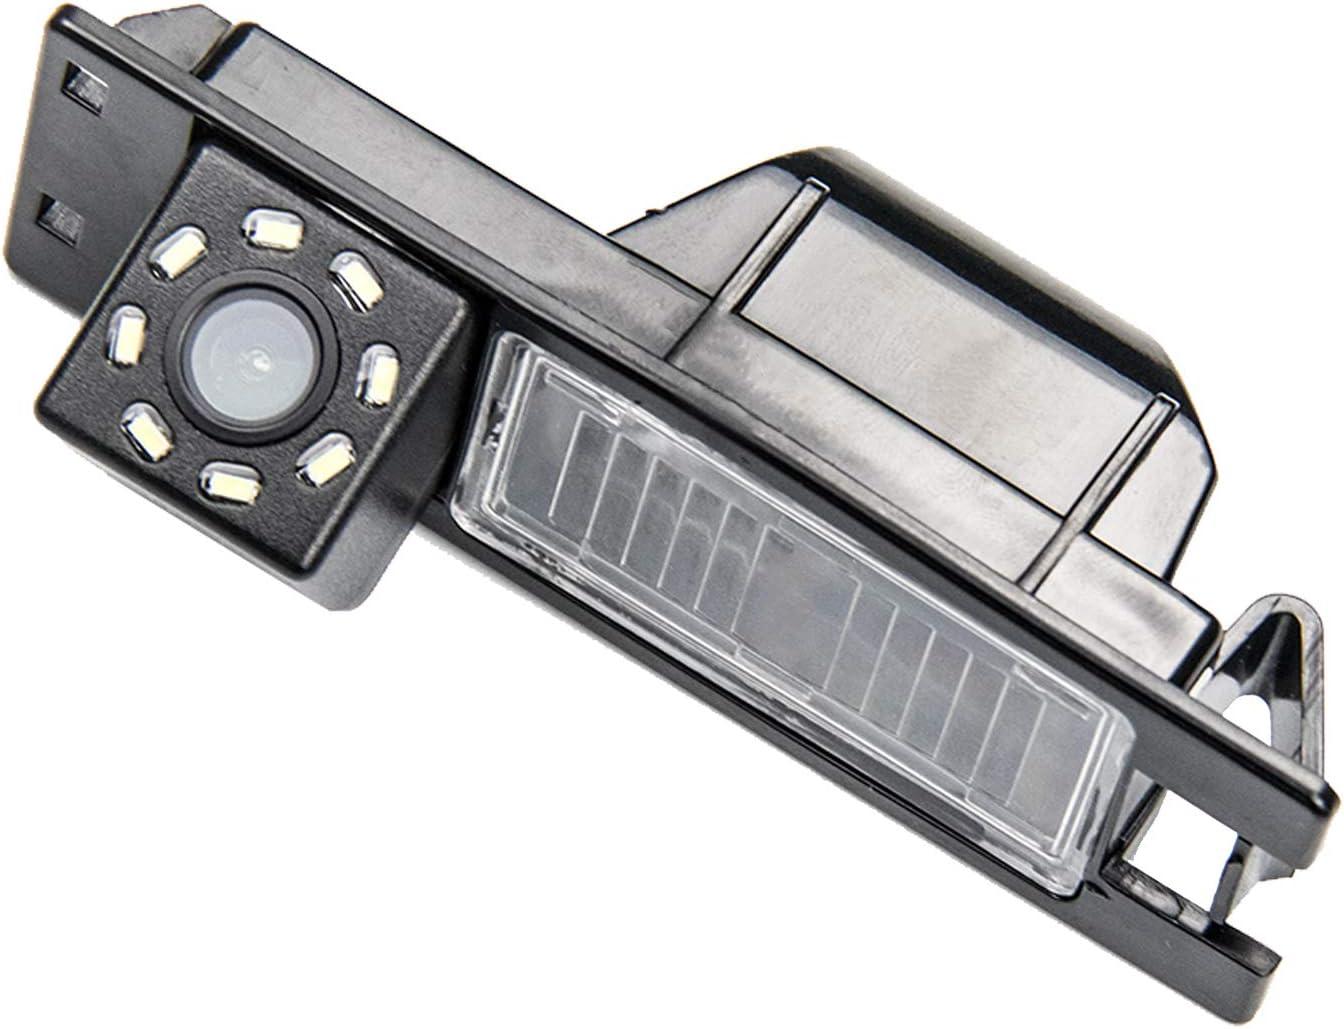 HD 720p Rear View Back Up Reverse Parking Camera in License Plate Waterproof Night Version (NTSC) for Alfa Romeo MiTo AR Furiosa Fiat Alfa Romeo 156/159 / 166/147 / Alfa Romeo Stelvio Spider Giu